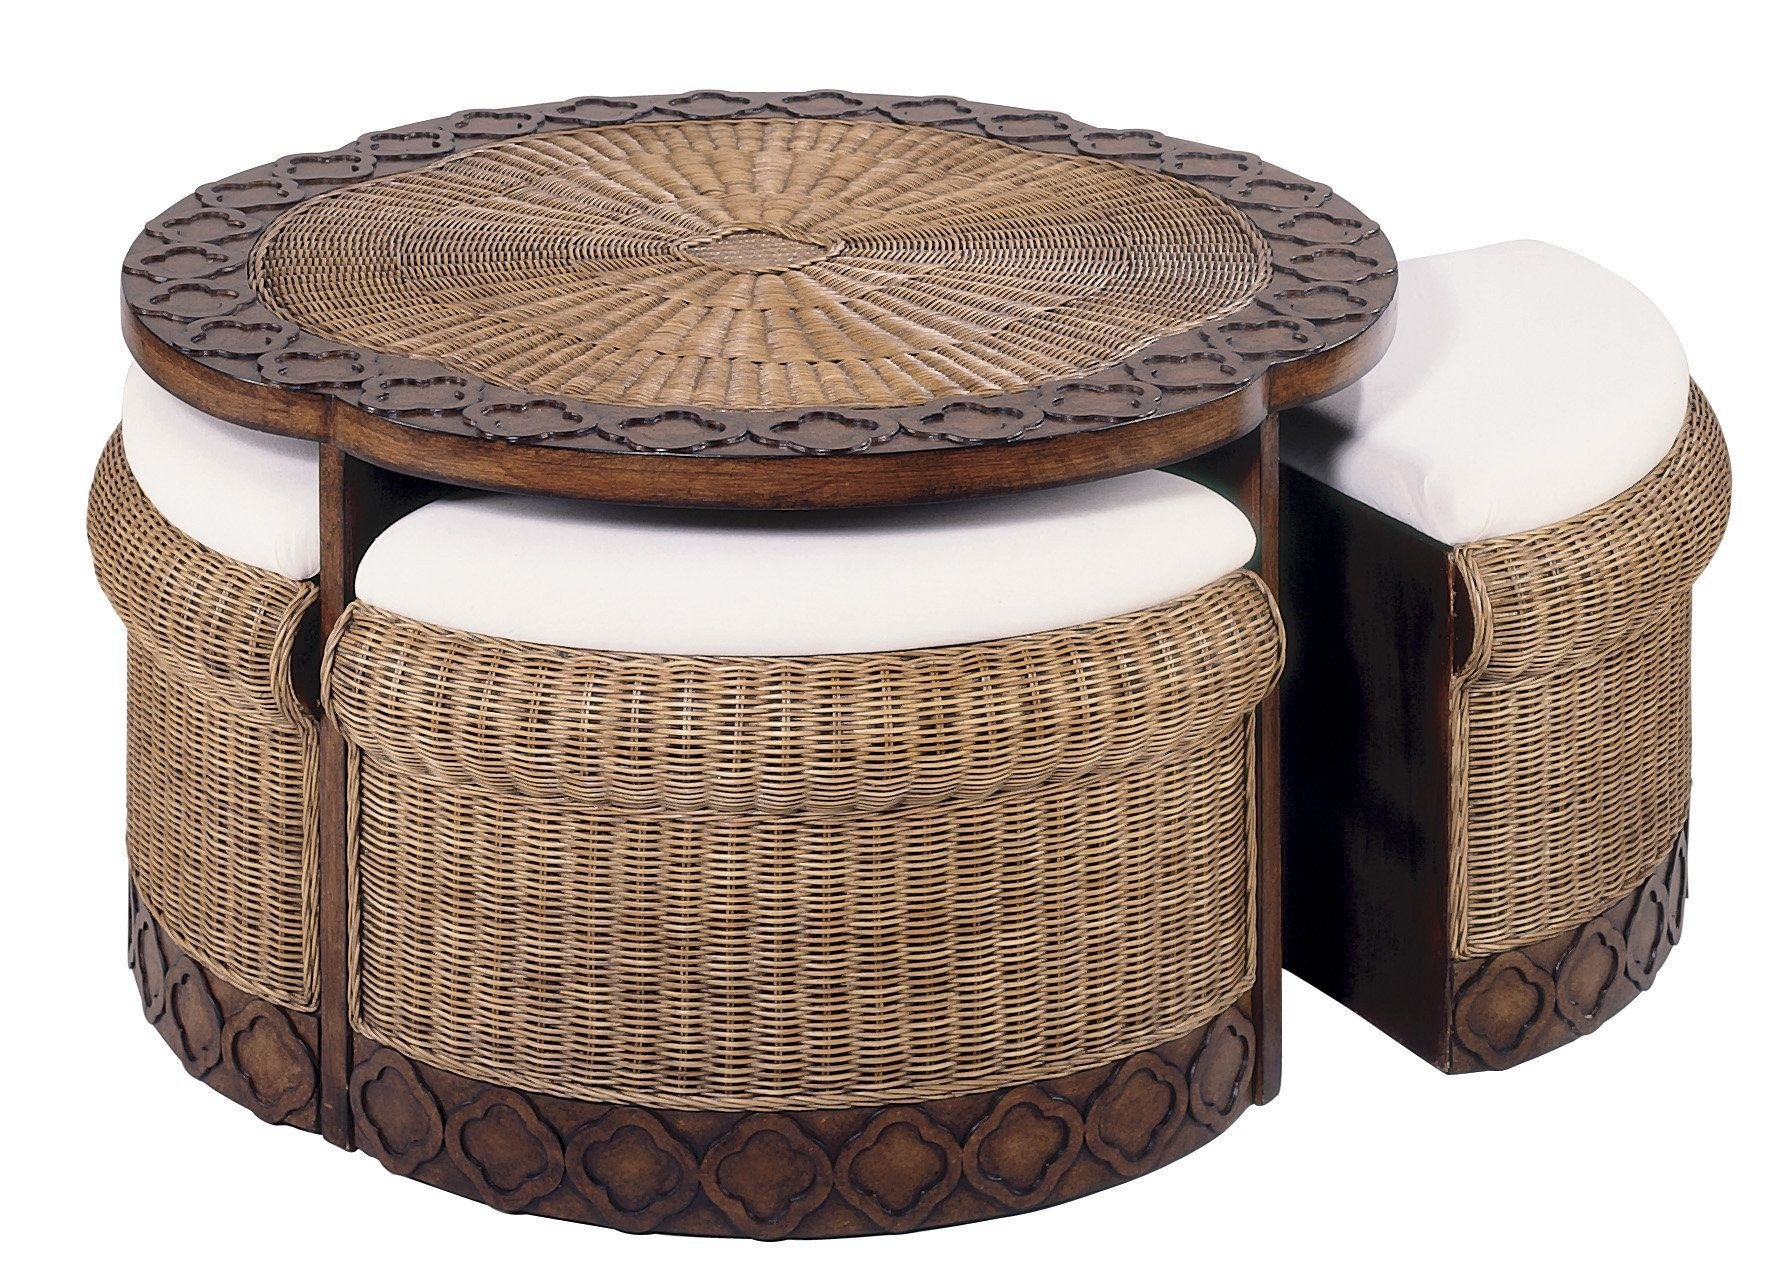 Charmant Round Wicker Ottoman Coffee Table 1